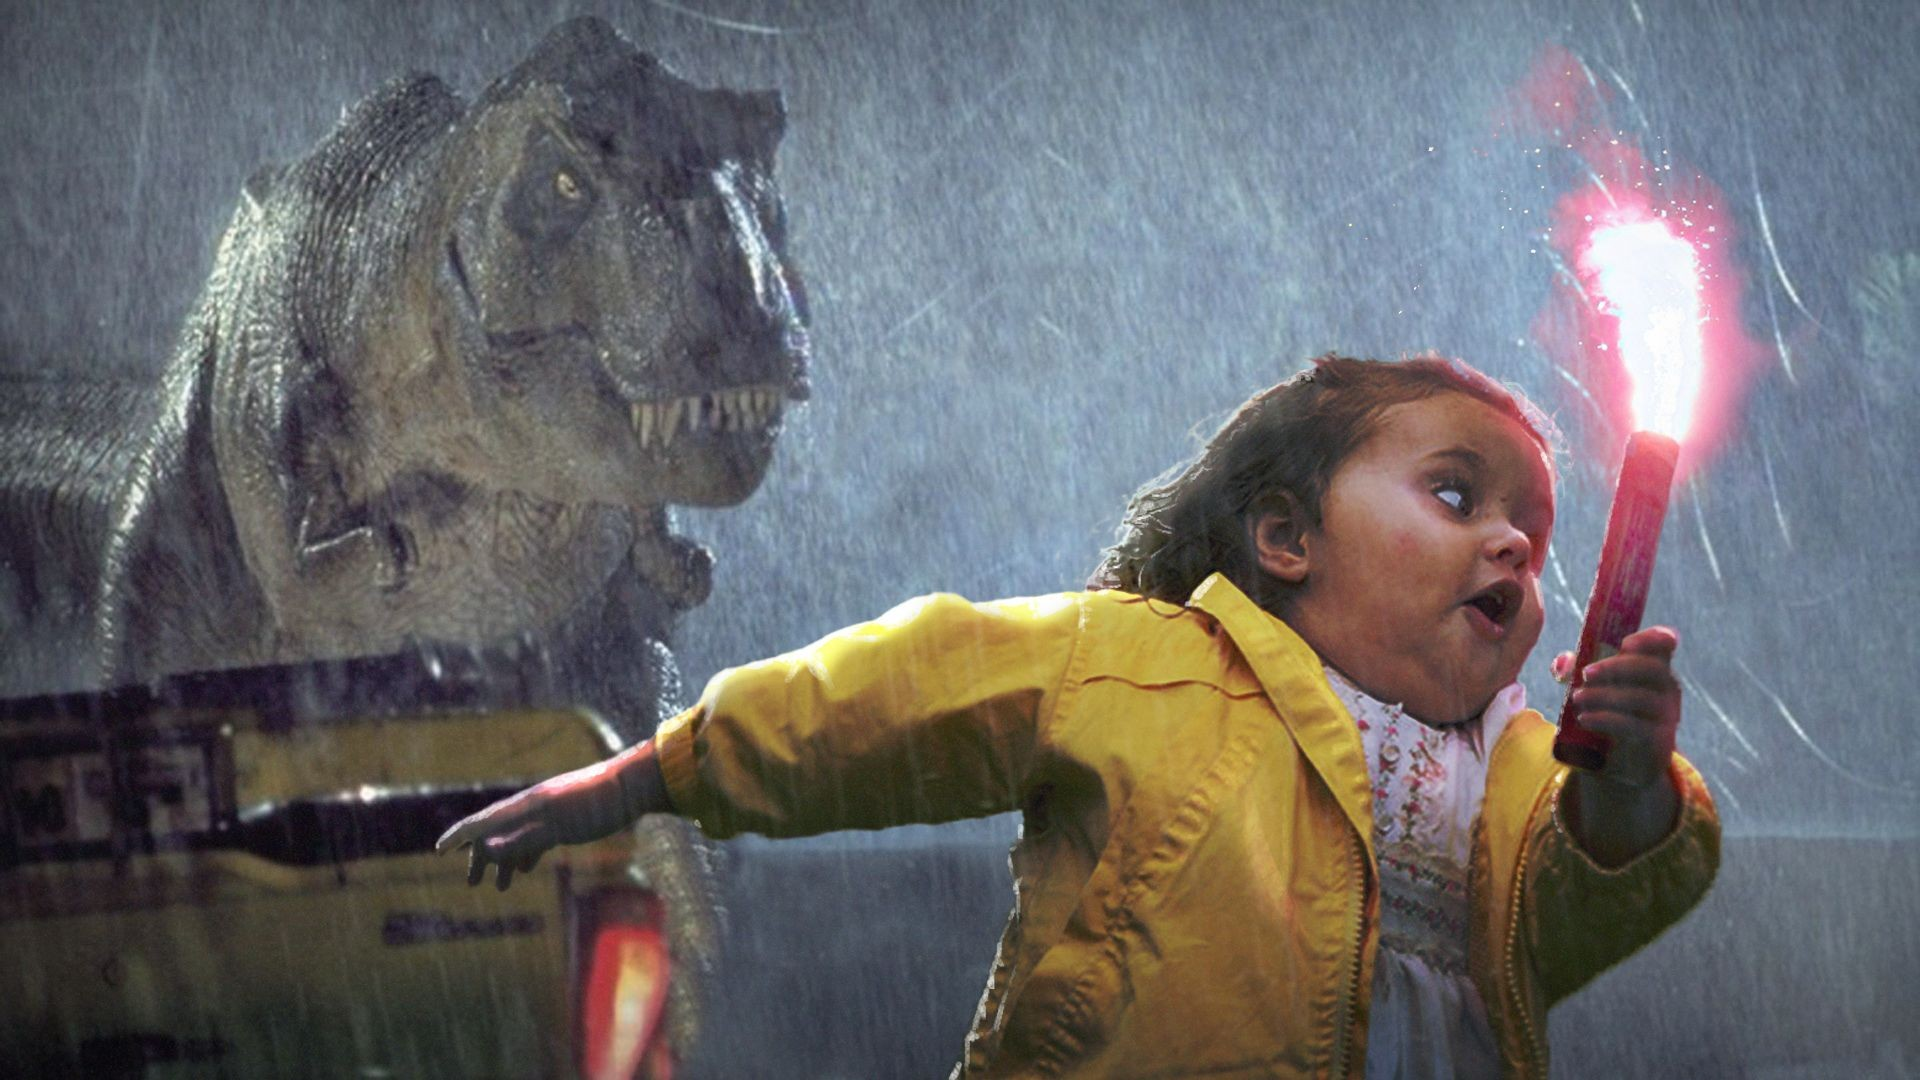 General 1920x1080 humor memes dark humor Jurassic Park Tyrannosaurus rex